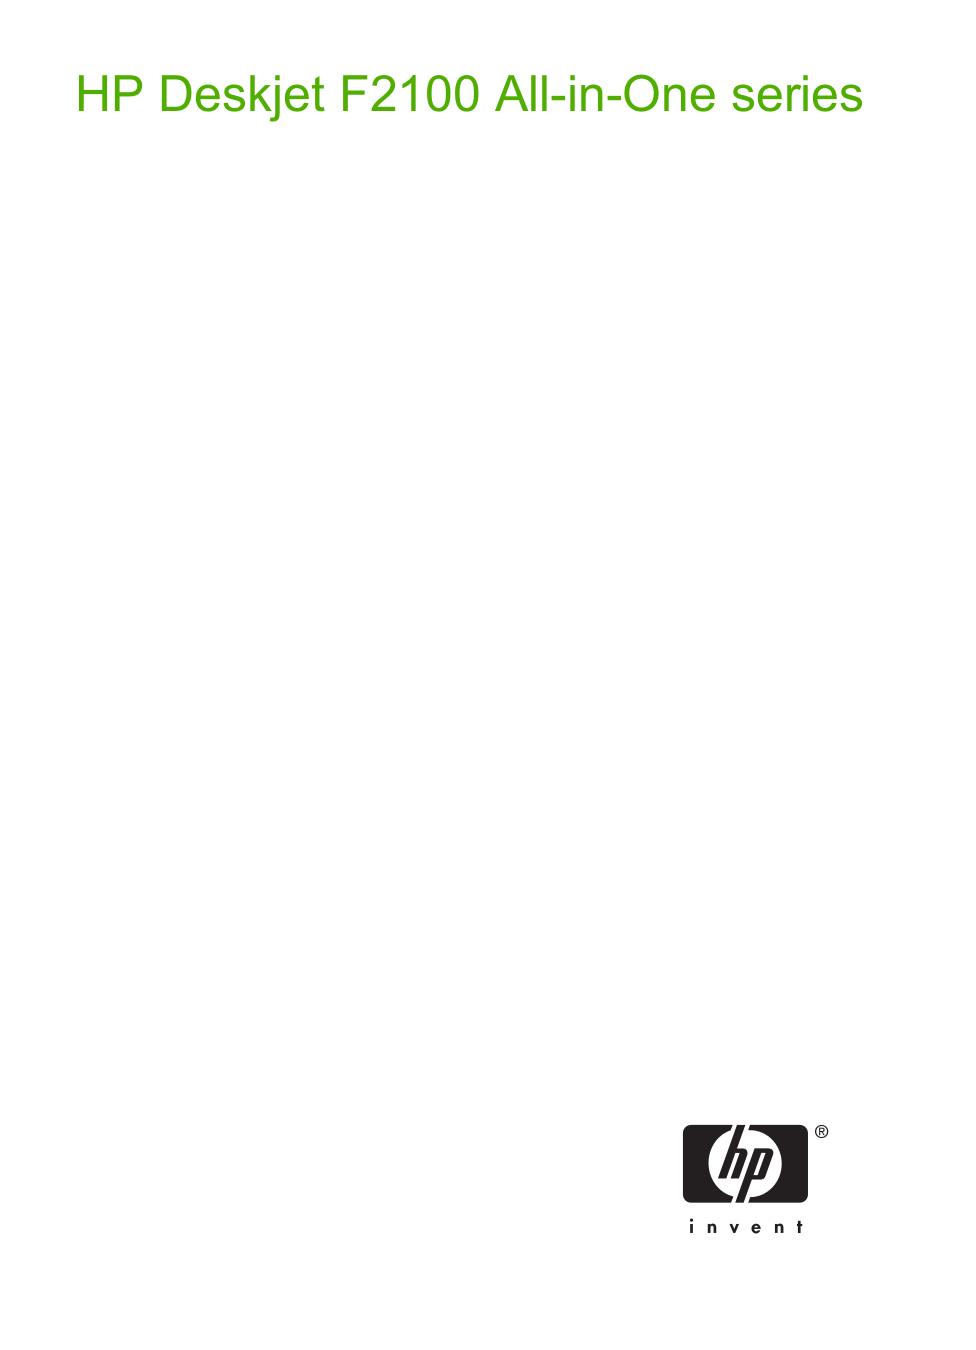 pdf for HP Multifunction Printer Deskjet F2120 manual